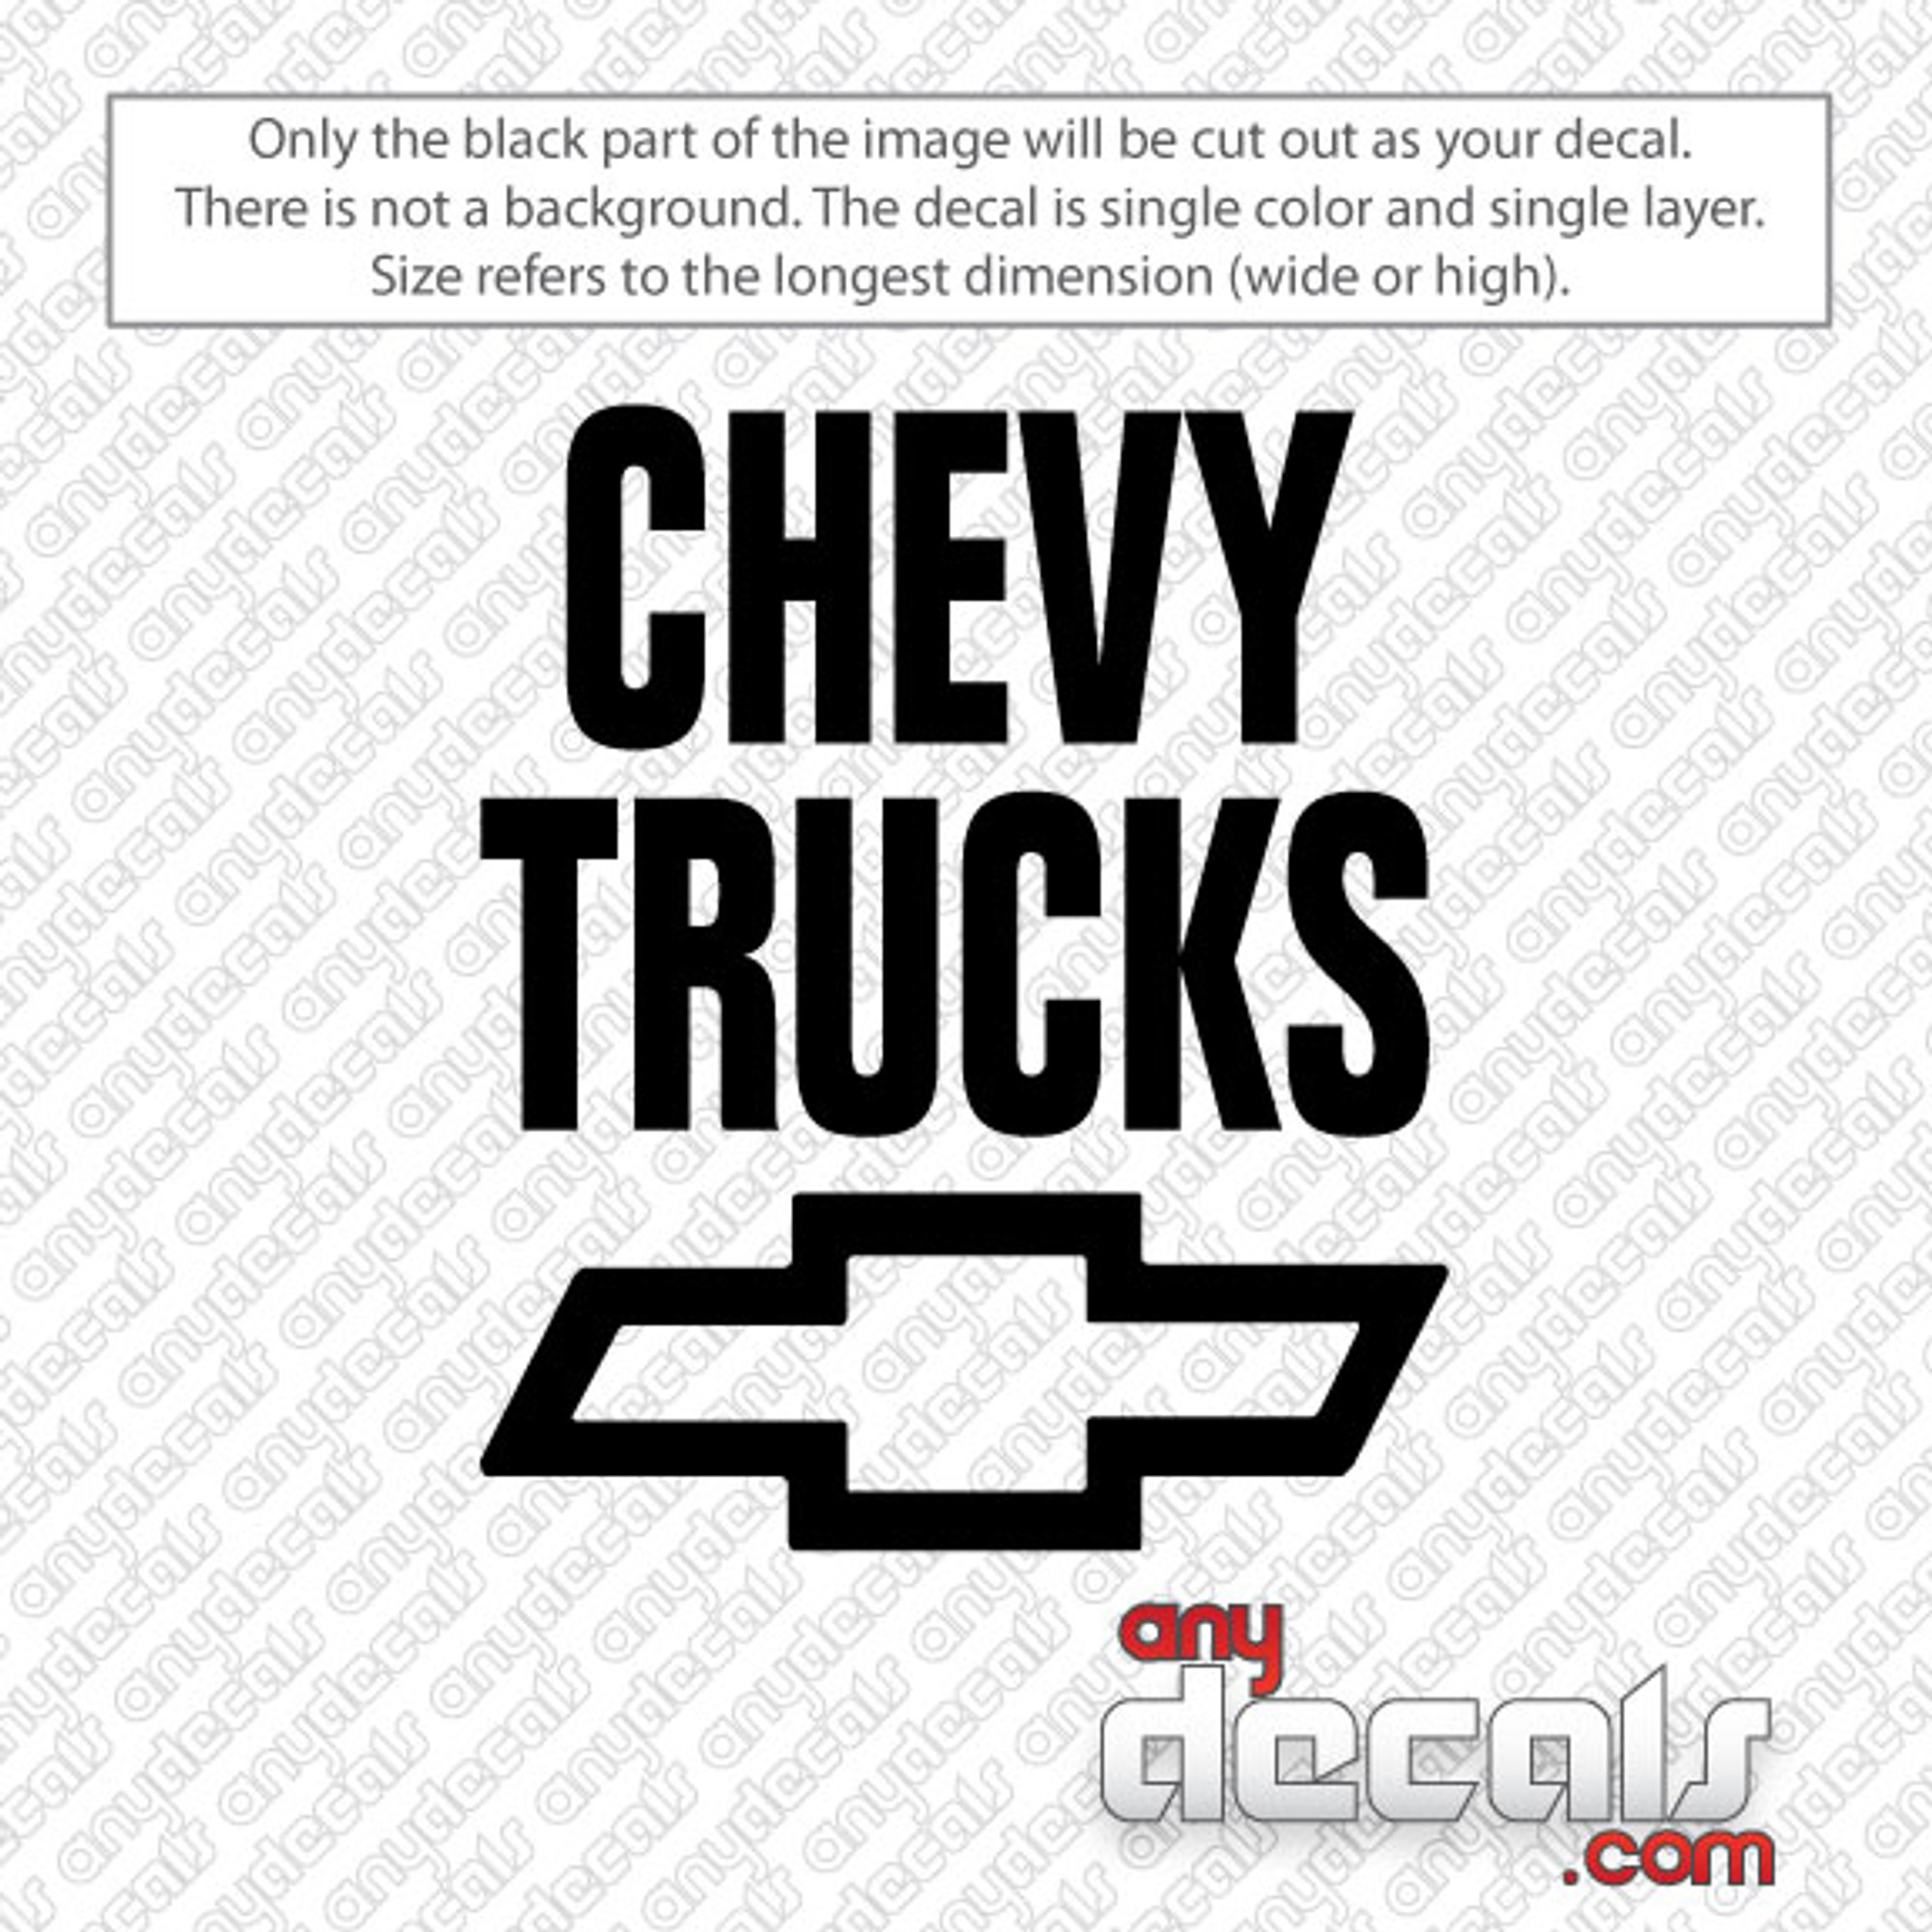 Chevy Trucks Car Decal